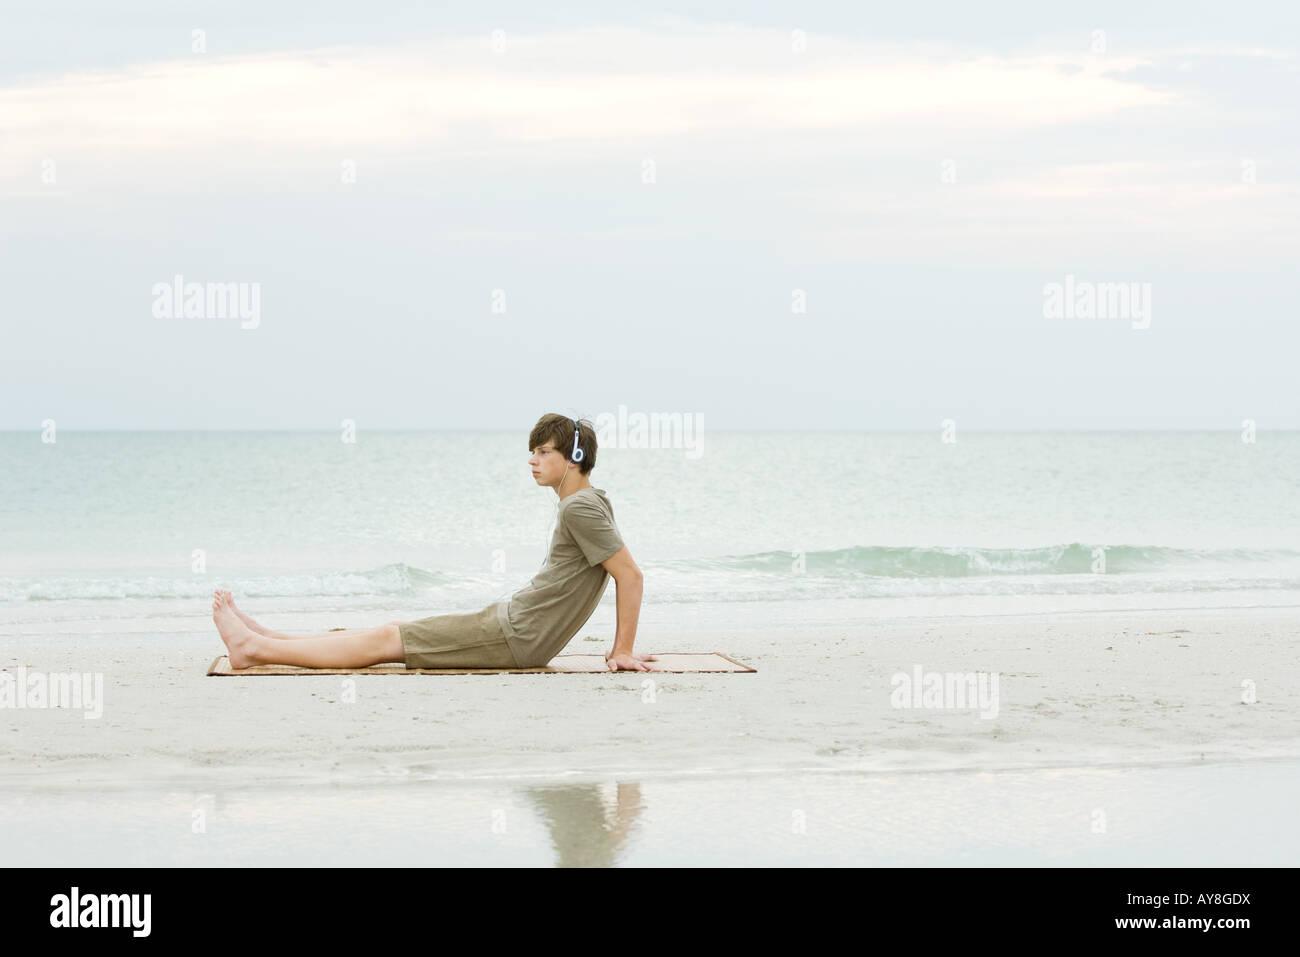 Teenage boy sitting on the beach, listening to headphones, side view Stock Photo